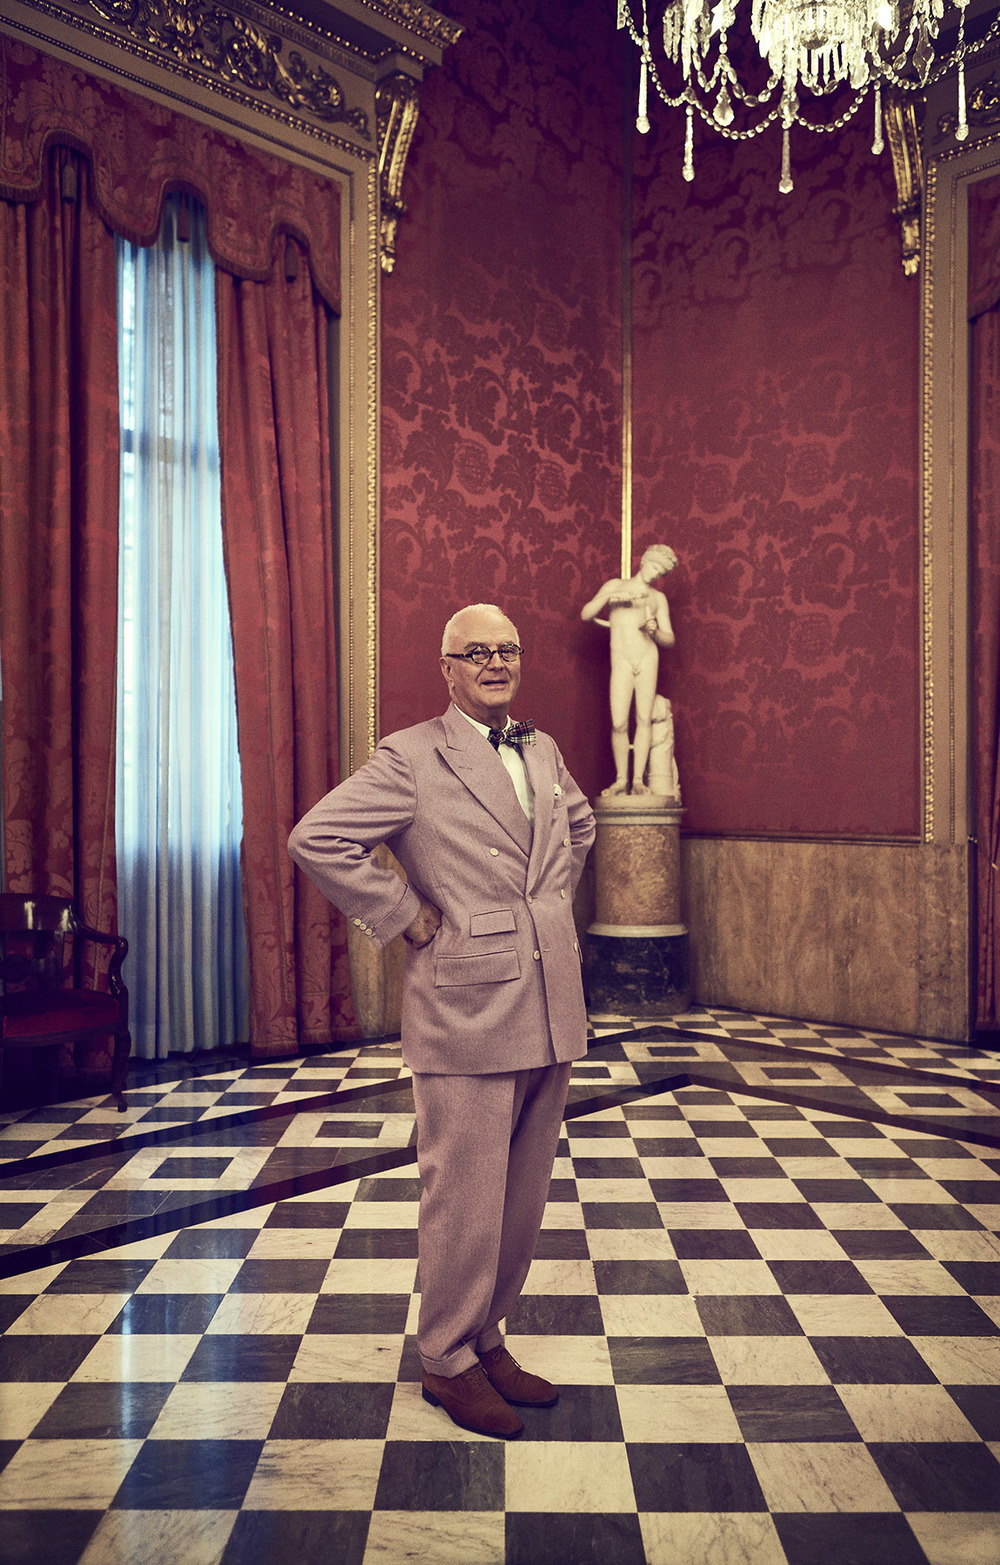 Manolo Blahnik,  best shoemaker in the world.   Client:  SModa/ EL PAIS Magazine   Location:  Llotja de Mar, Barcelona.